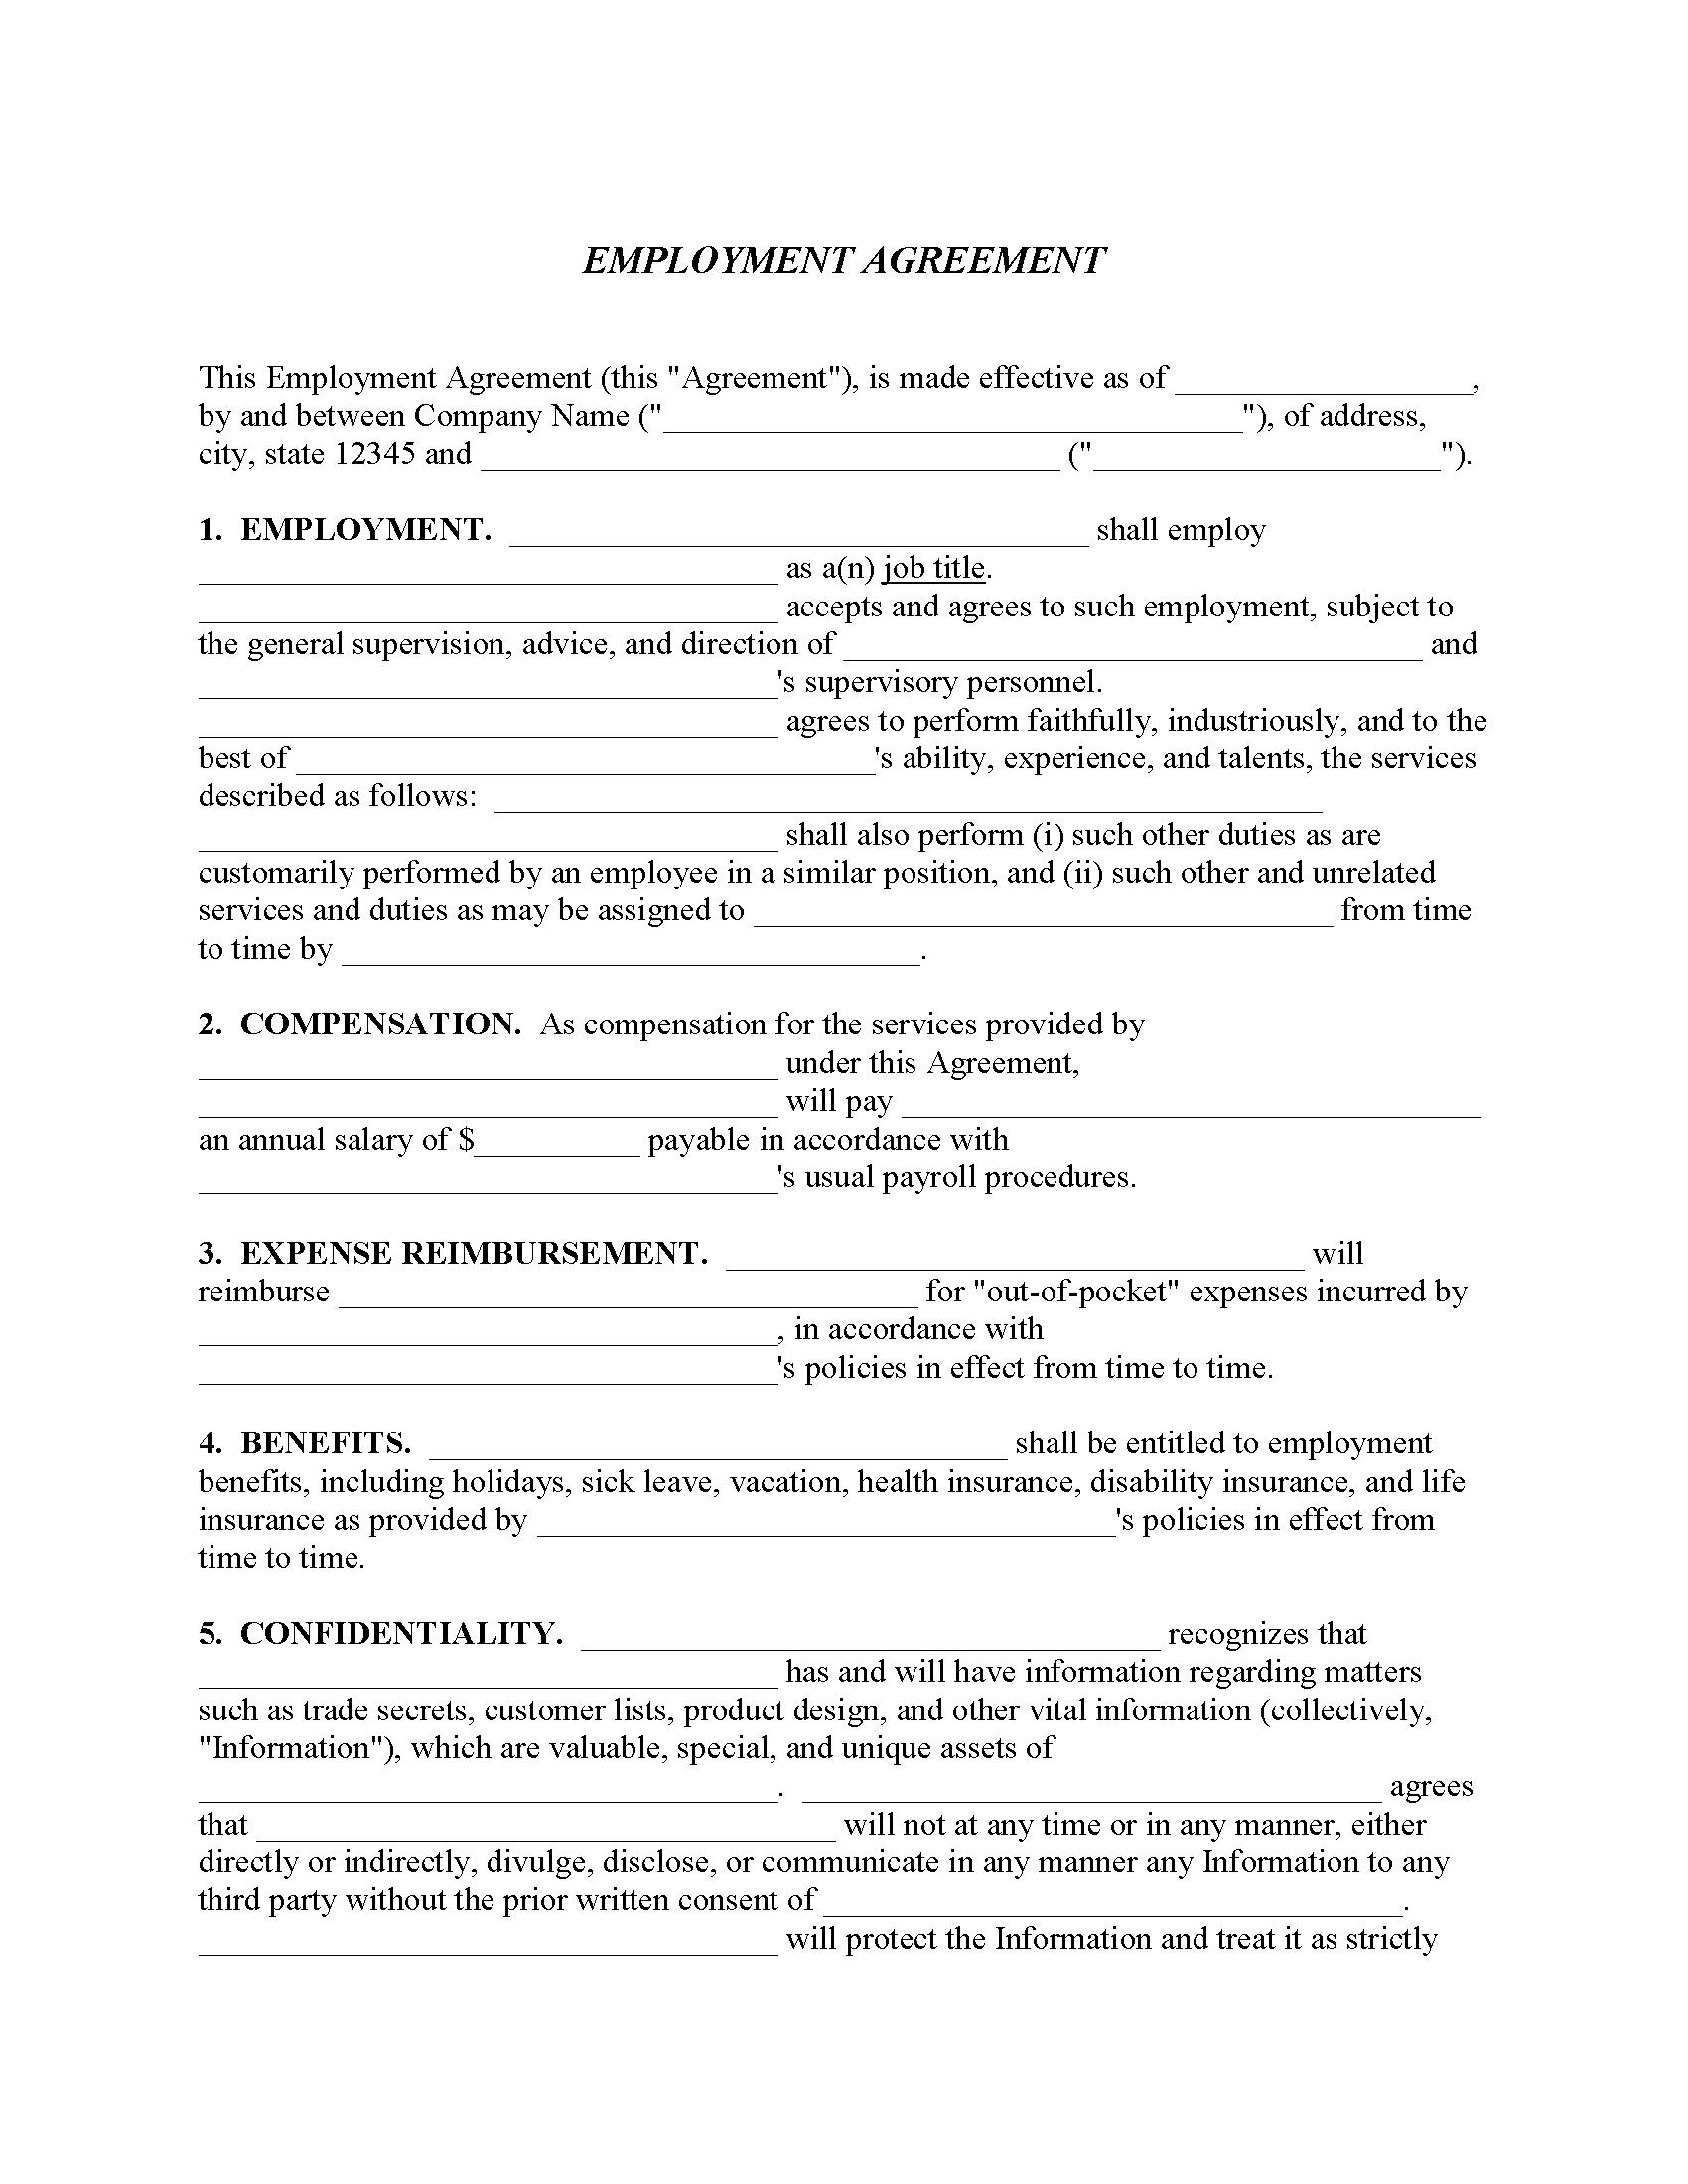 Employment Agreement Quick Form